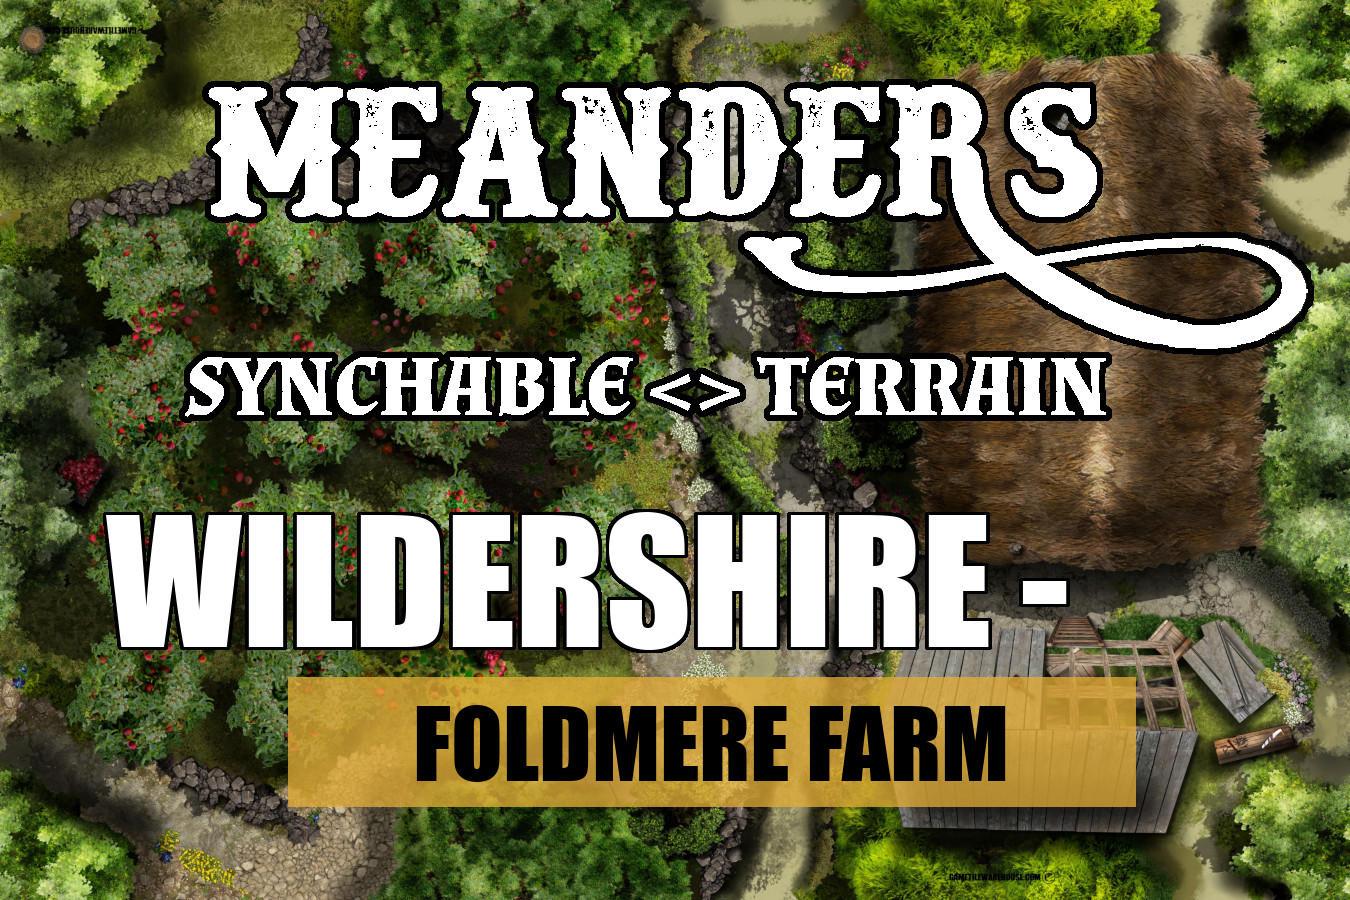 Wildershire 04 - Foldmere Farm